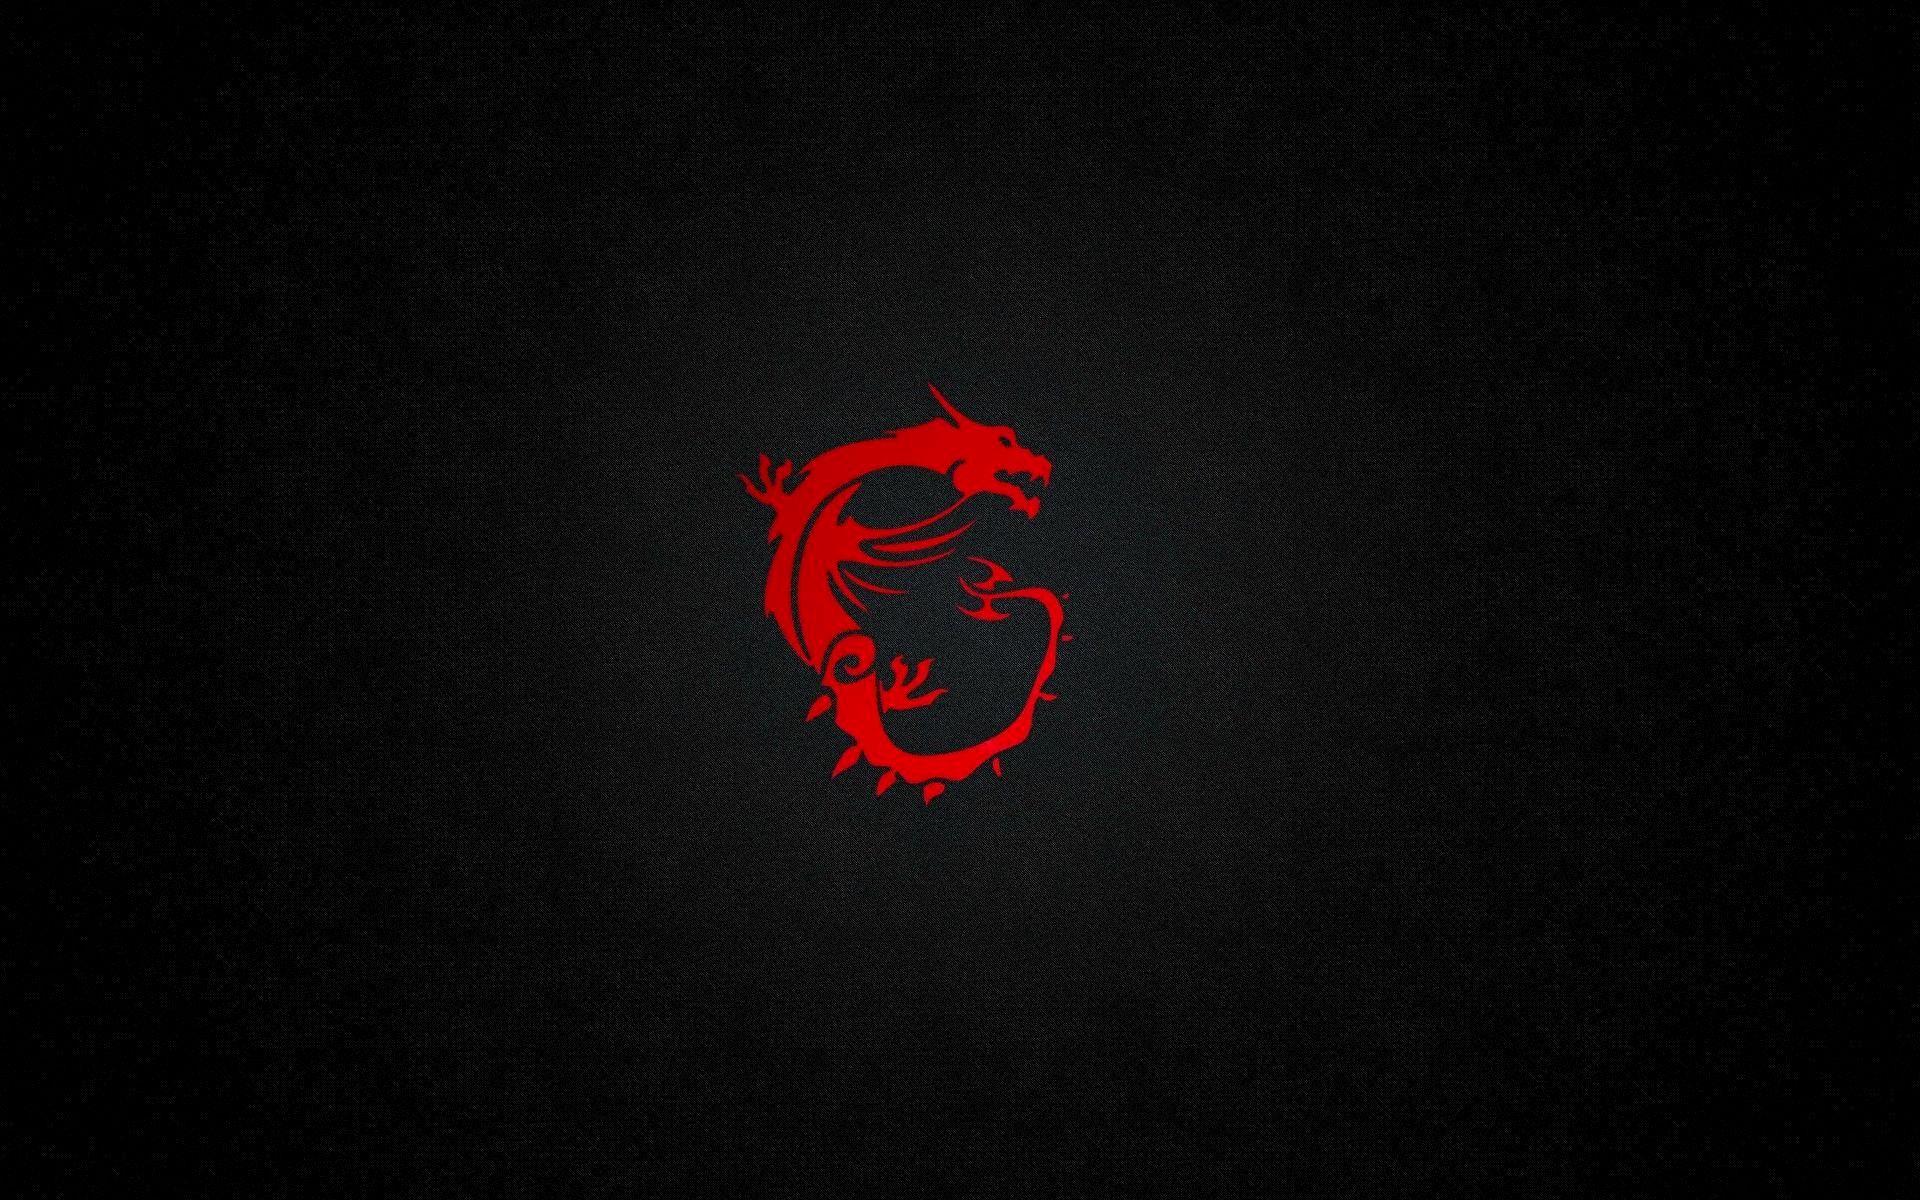 4K Wallpaper Gaming Reddit Gallery Check more at https